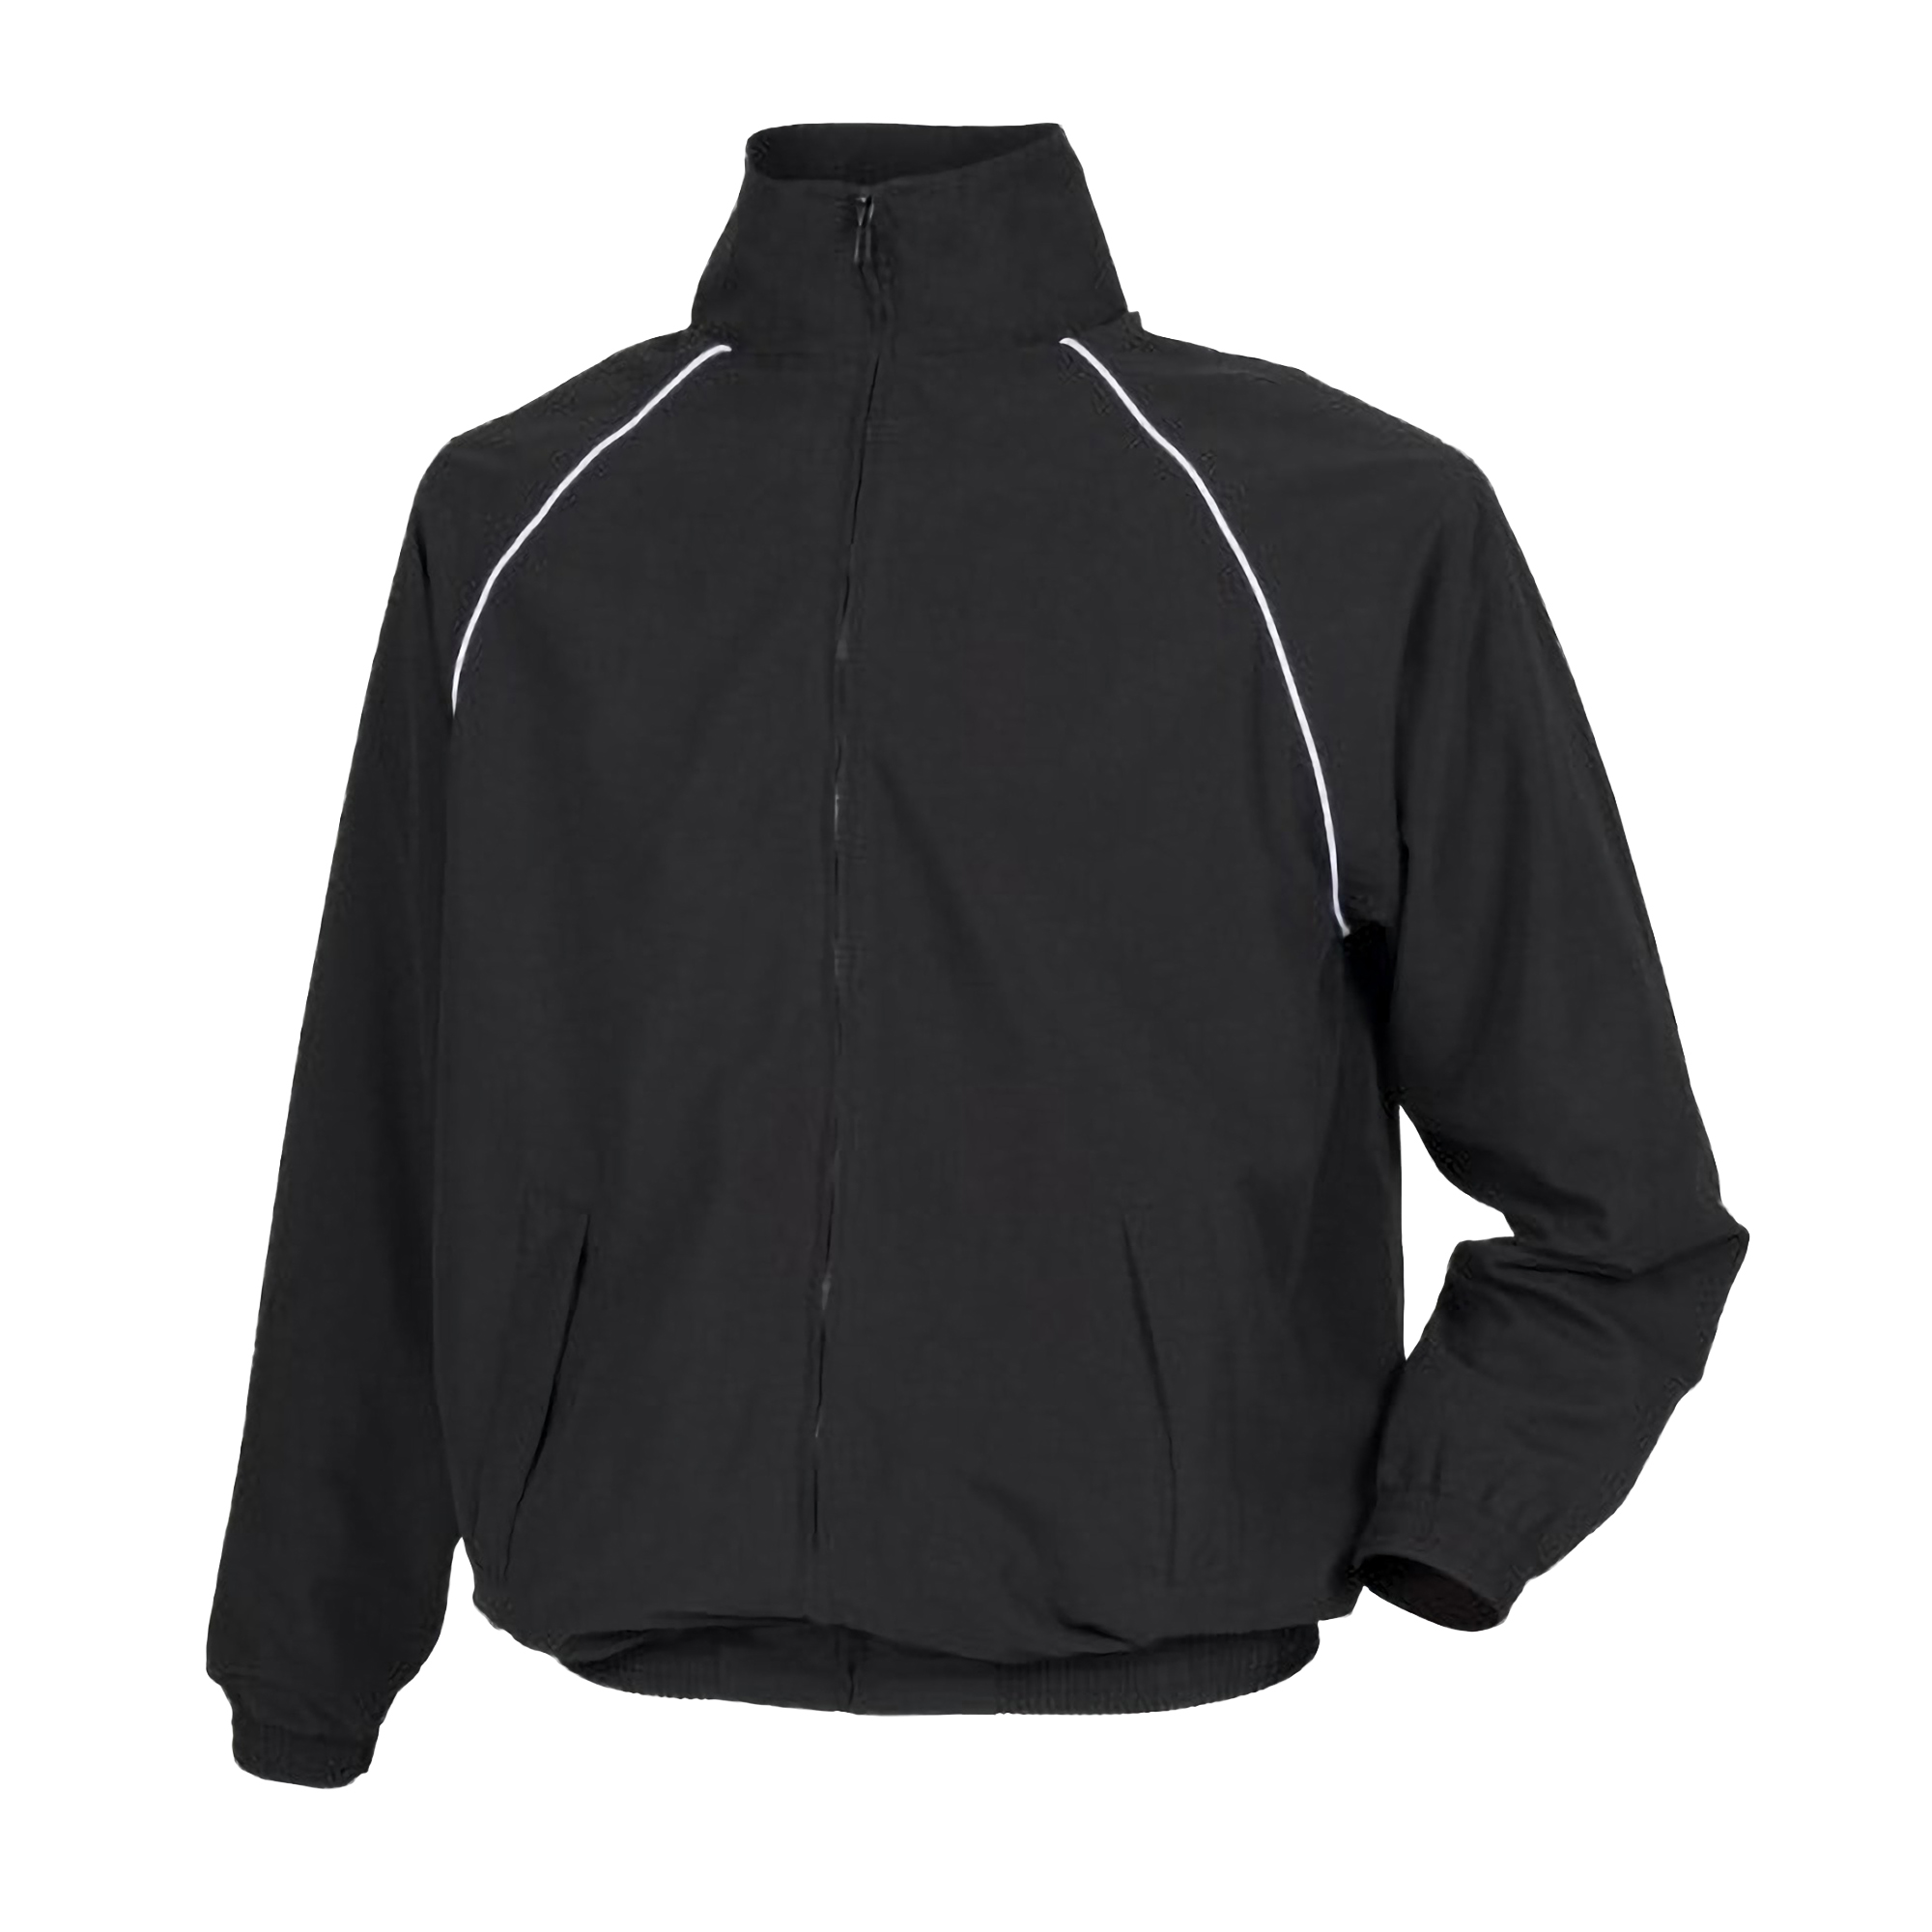 Tombo Teamsport Childrens Unisex Start Line Track Sports Training Jacket (S) (Black/ White piping)